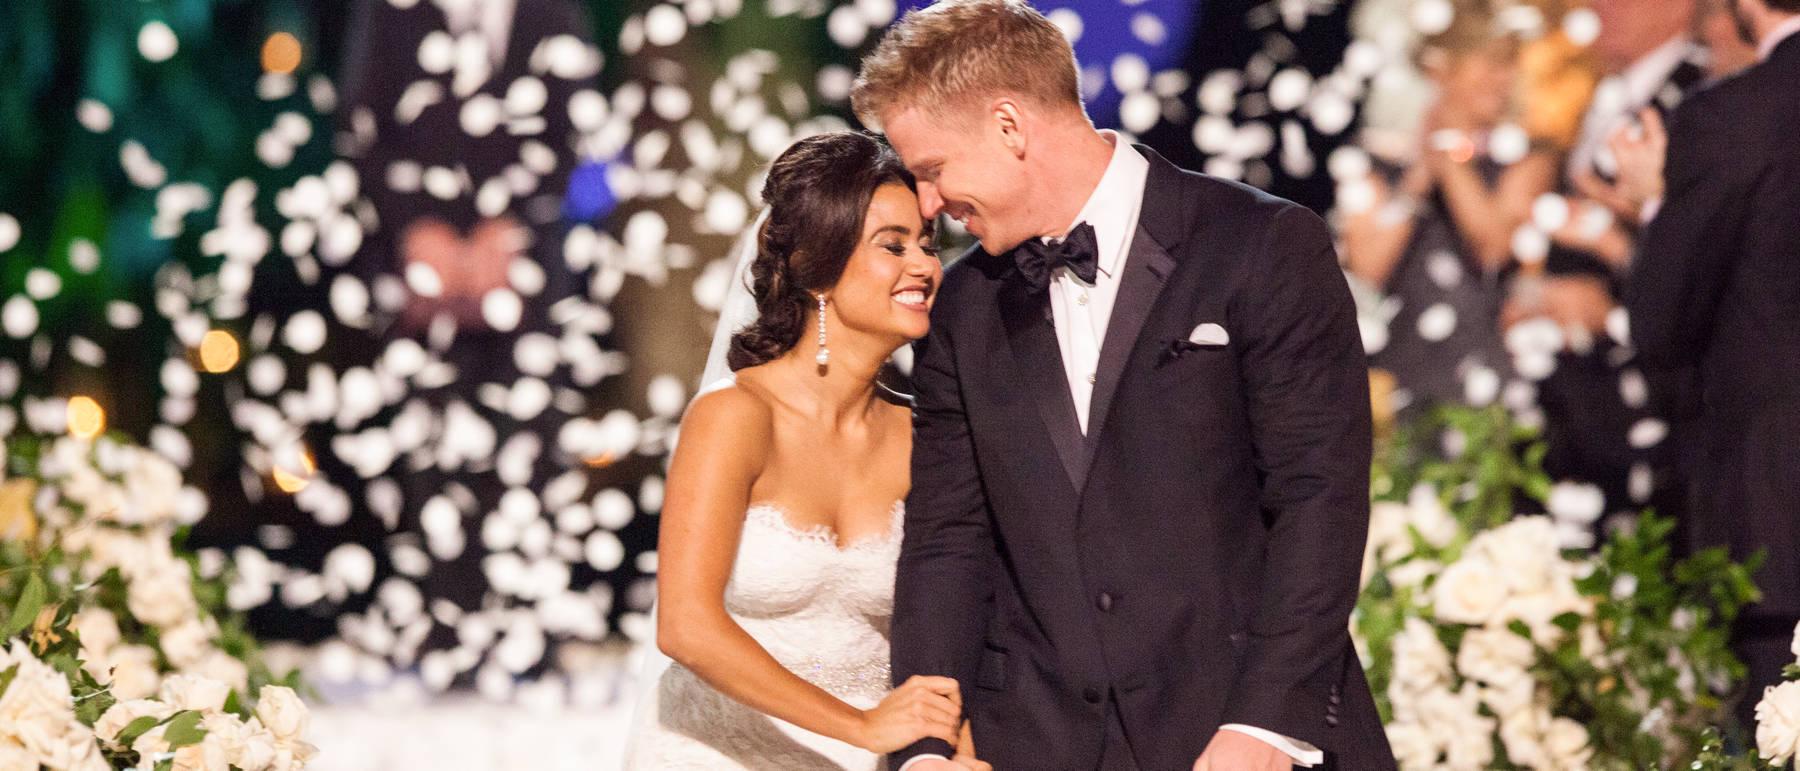 johnandjoseph-wedding-photographer-hz-slider-317